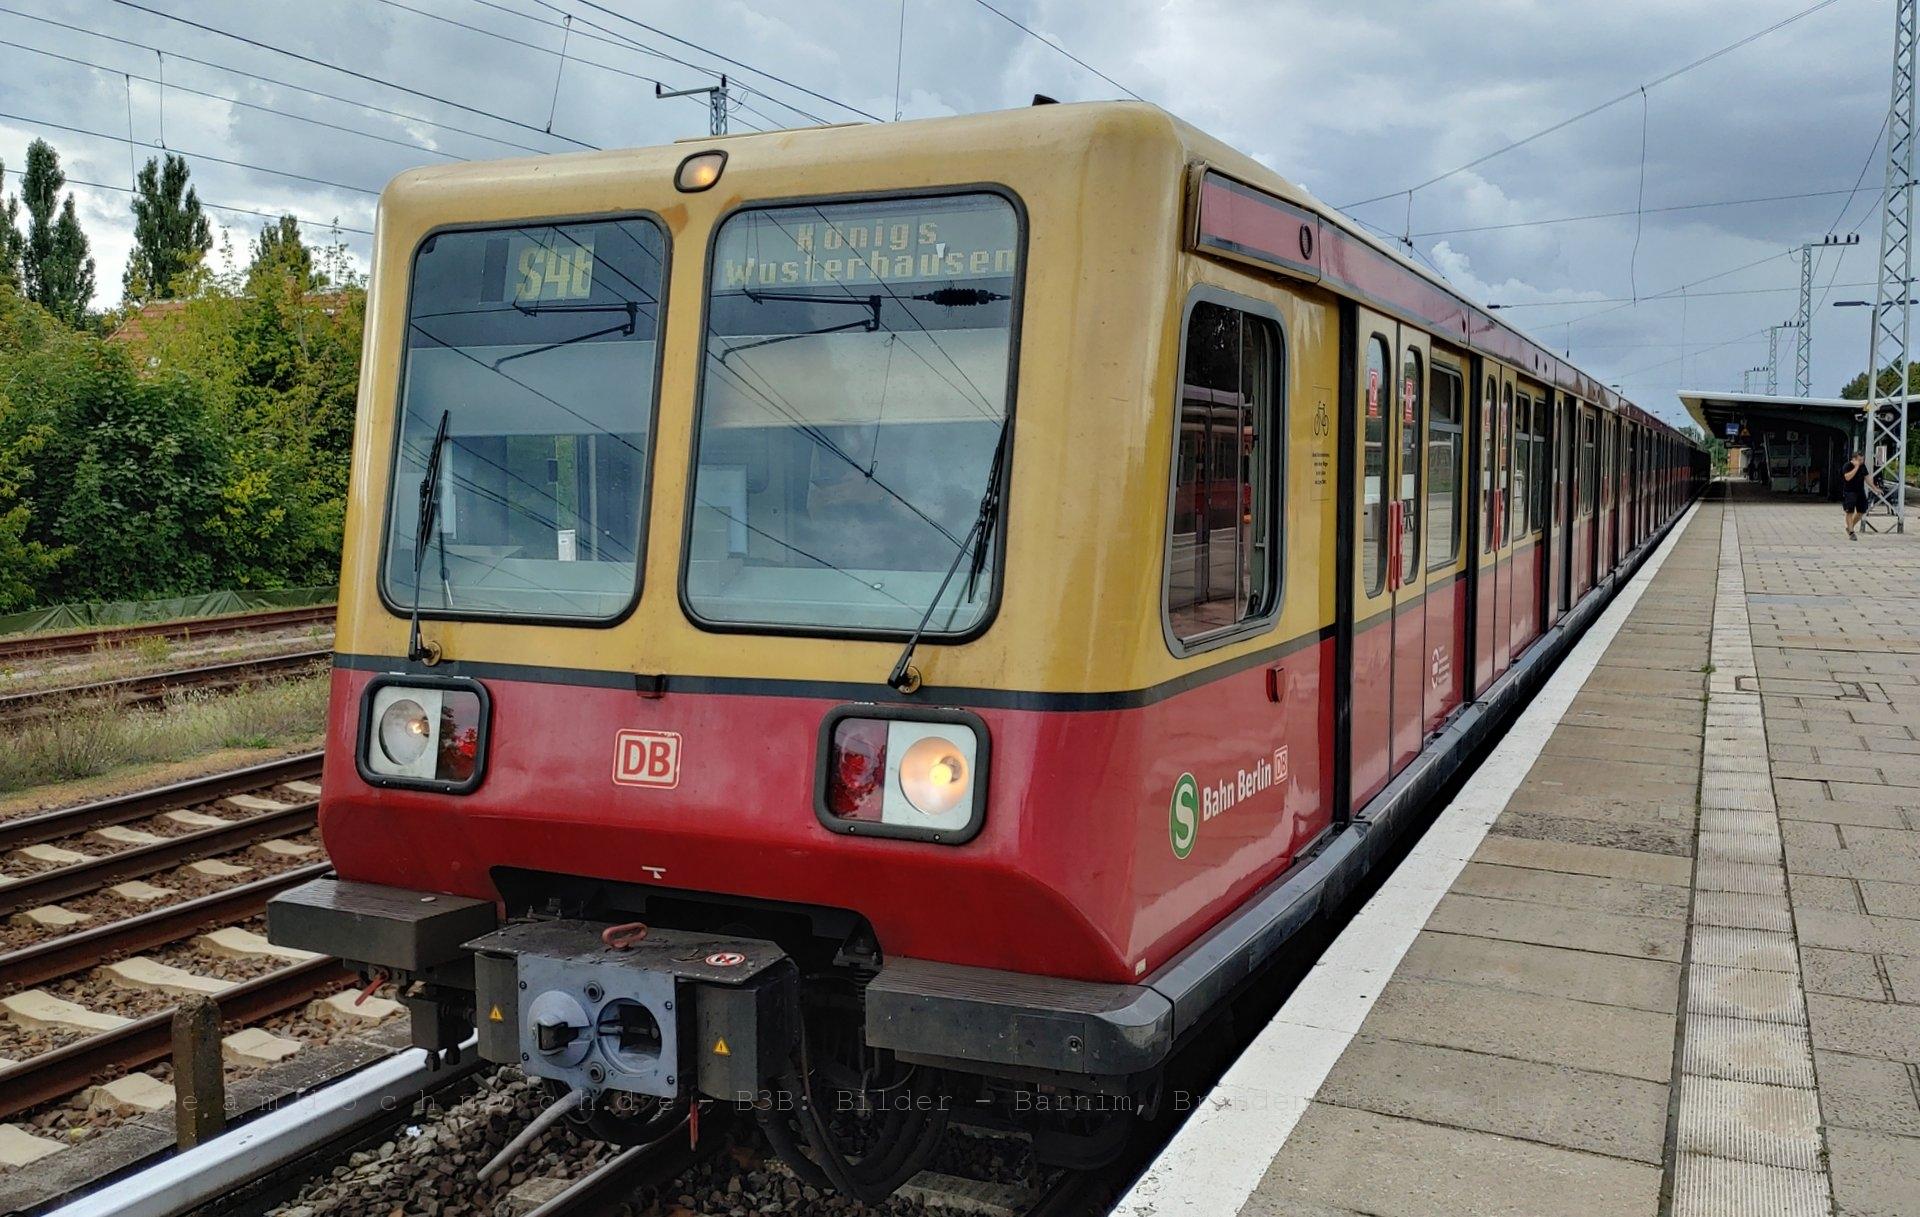 S-Bahn Berlin, Triebwagen 485 028-5